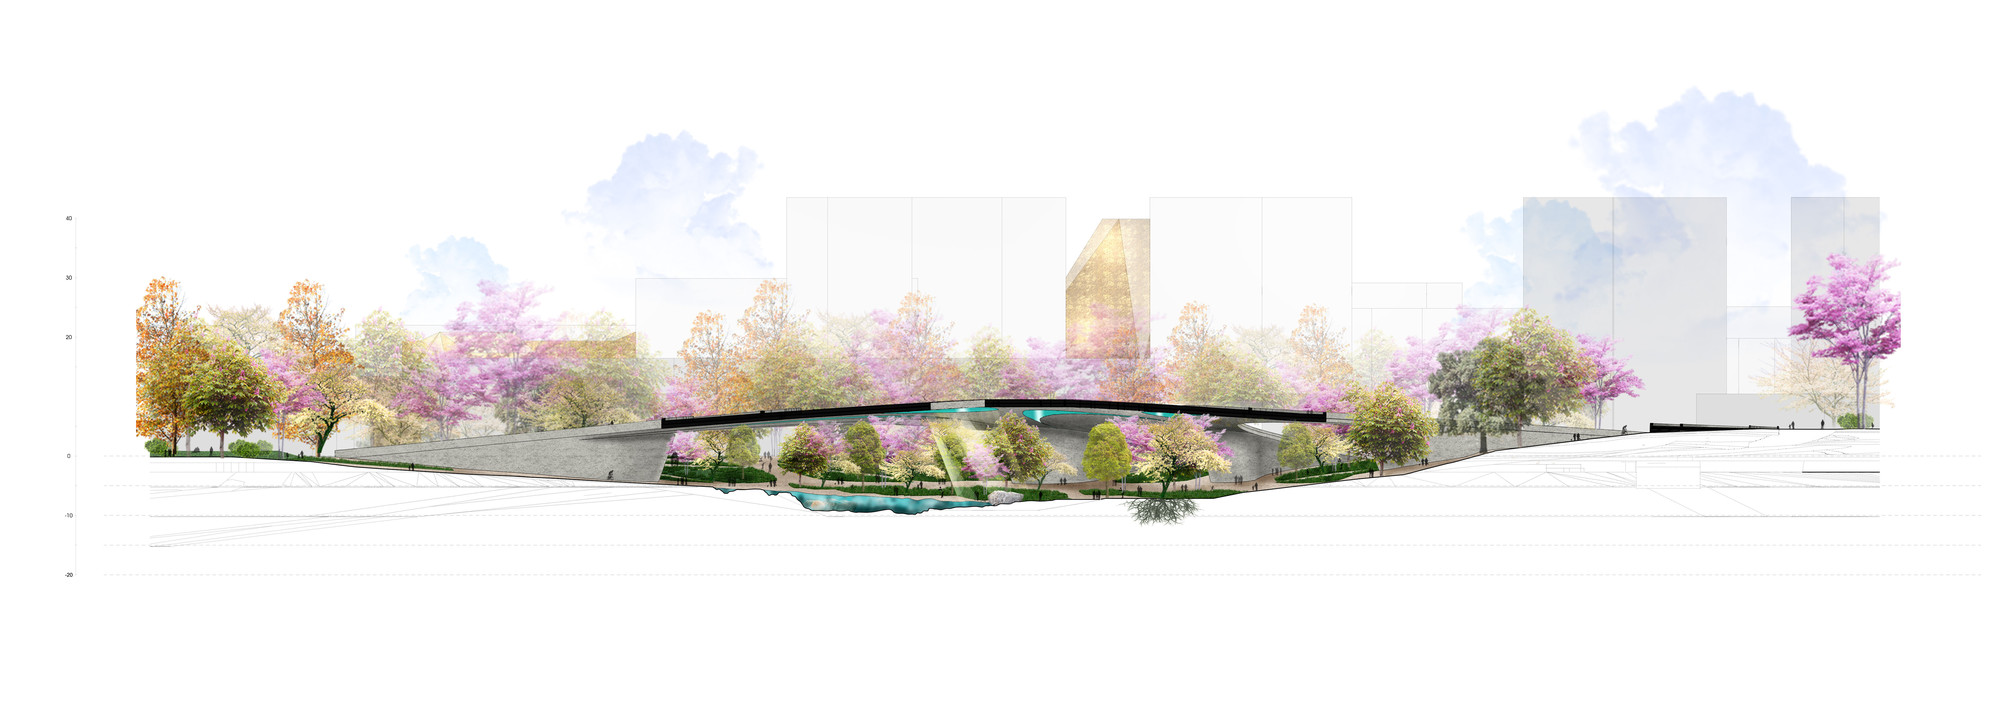 Sección. Image Cortesia de Rubio Arquitectura